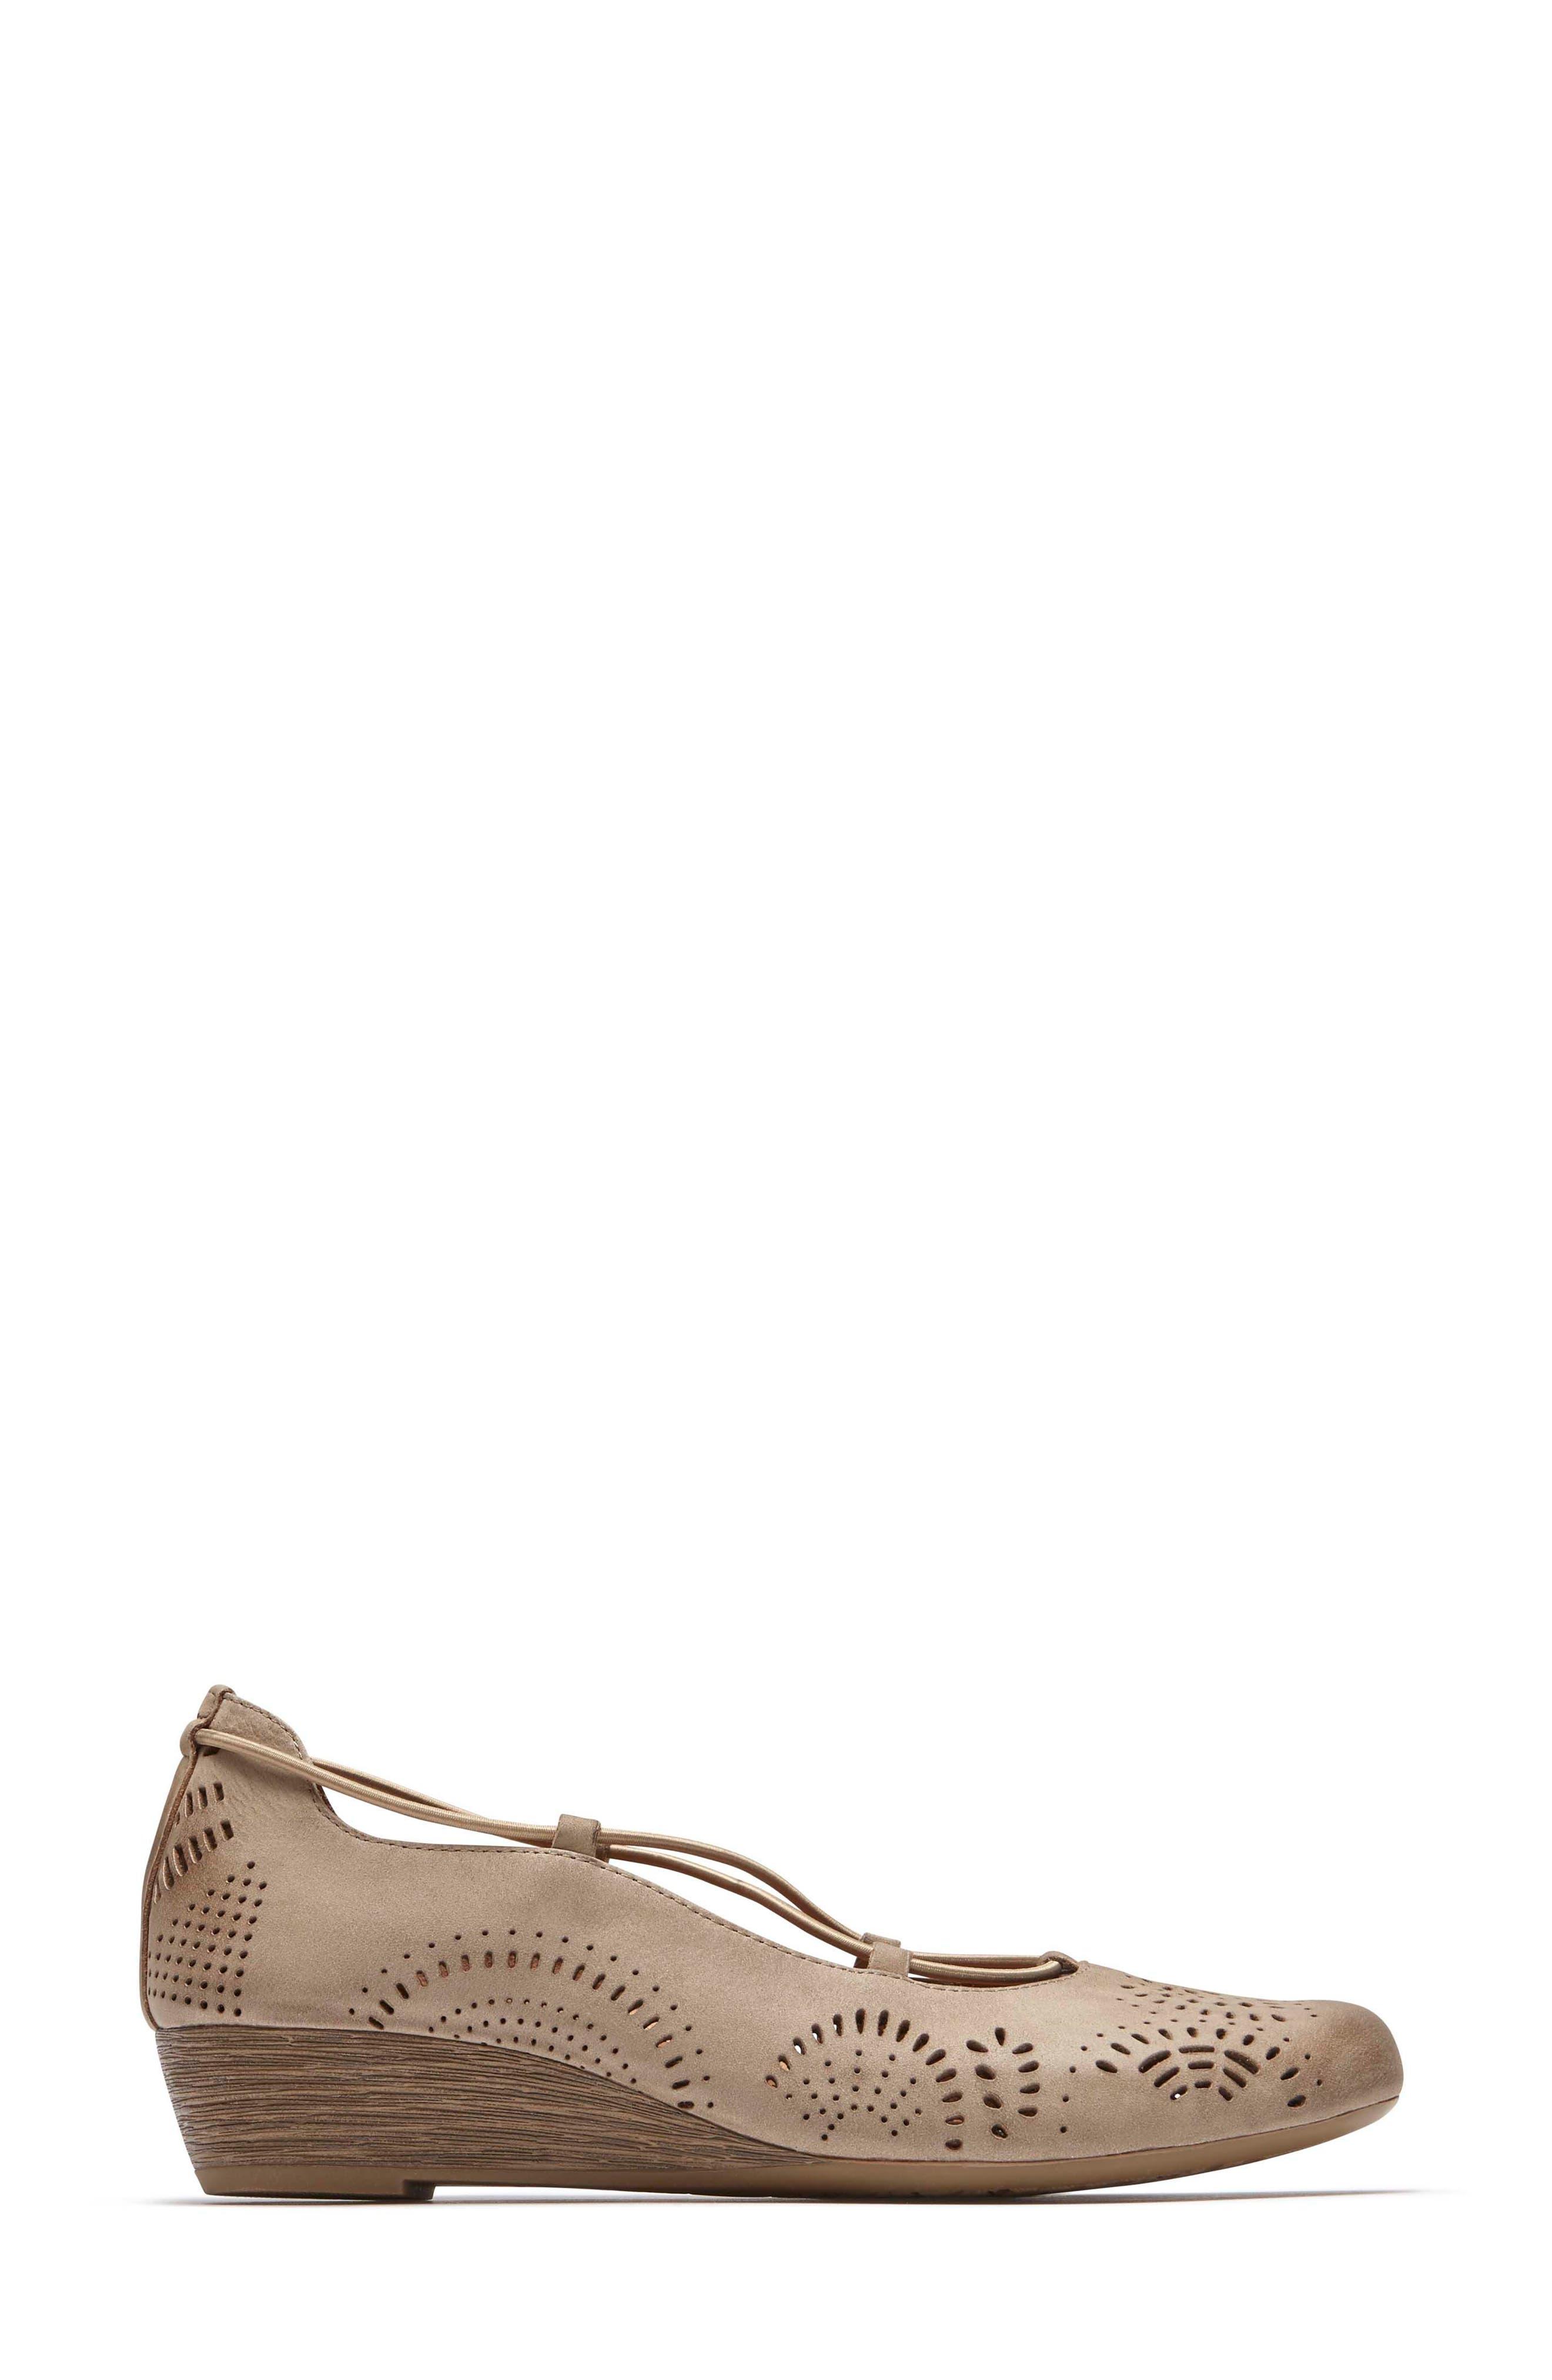 Janna Cross Strap Wedge Sandal,                             Alternate thumbnail 14, color,